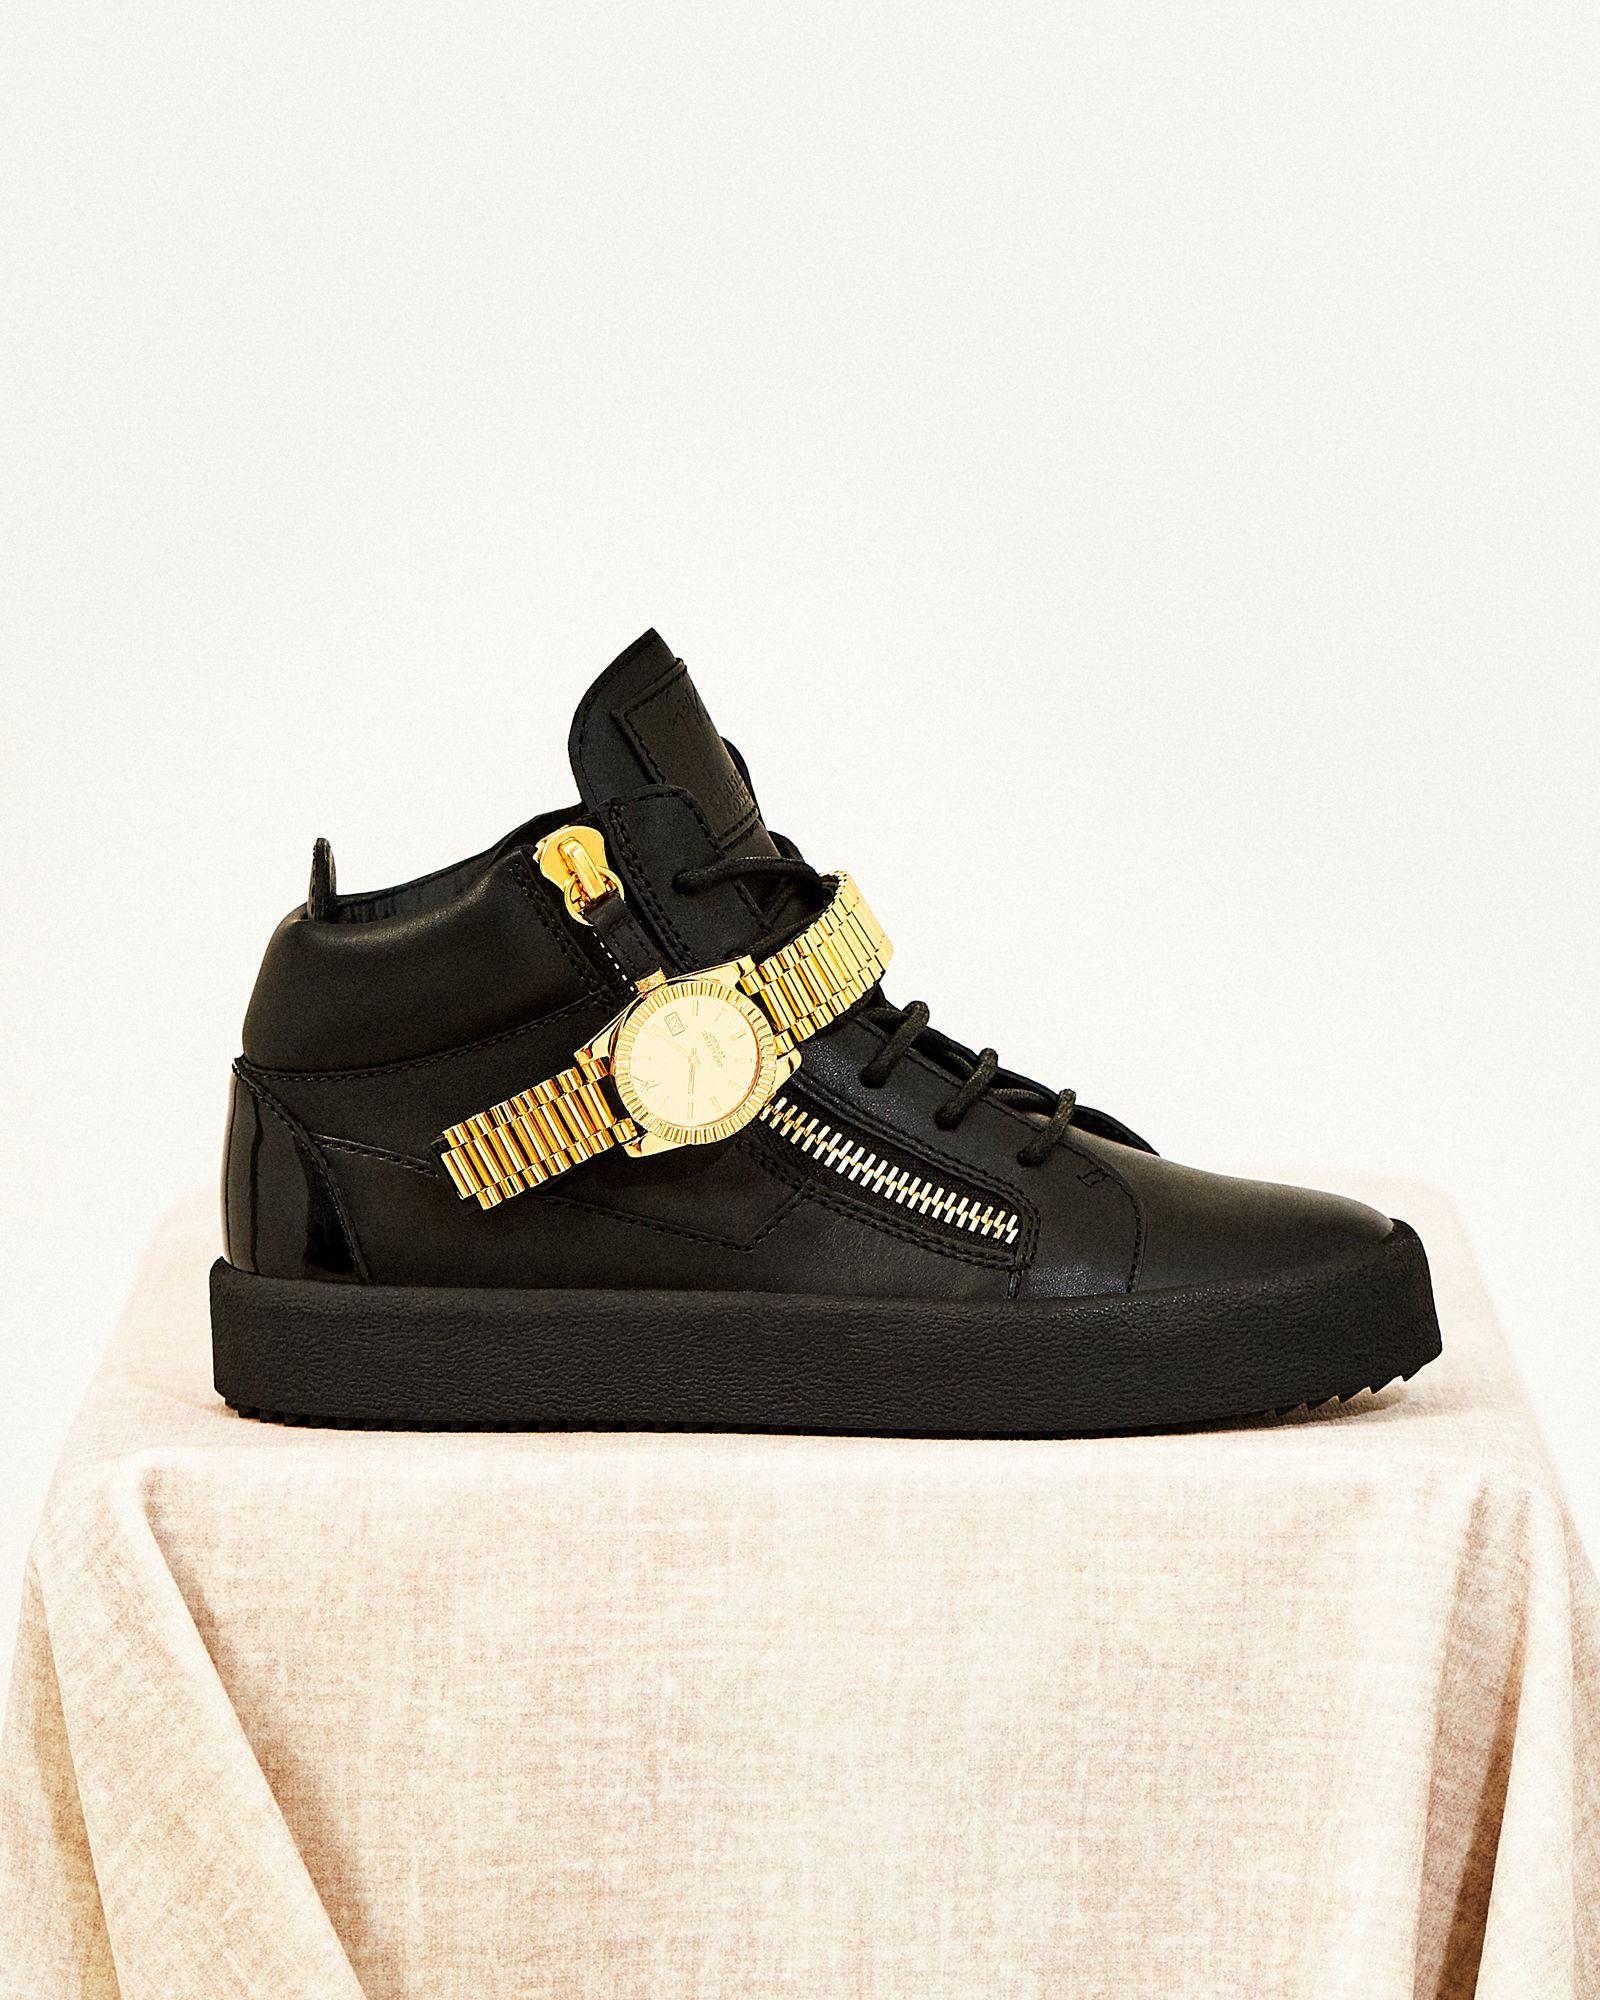 c0c87a6d1 The GZXCOWAN Midtop Sneaker. Yes!  GZxCC  ChristianCowan